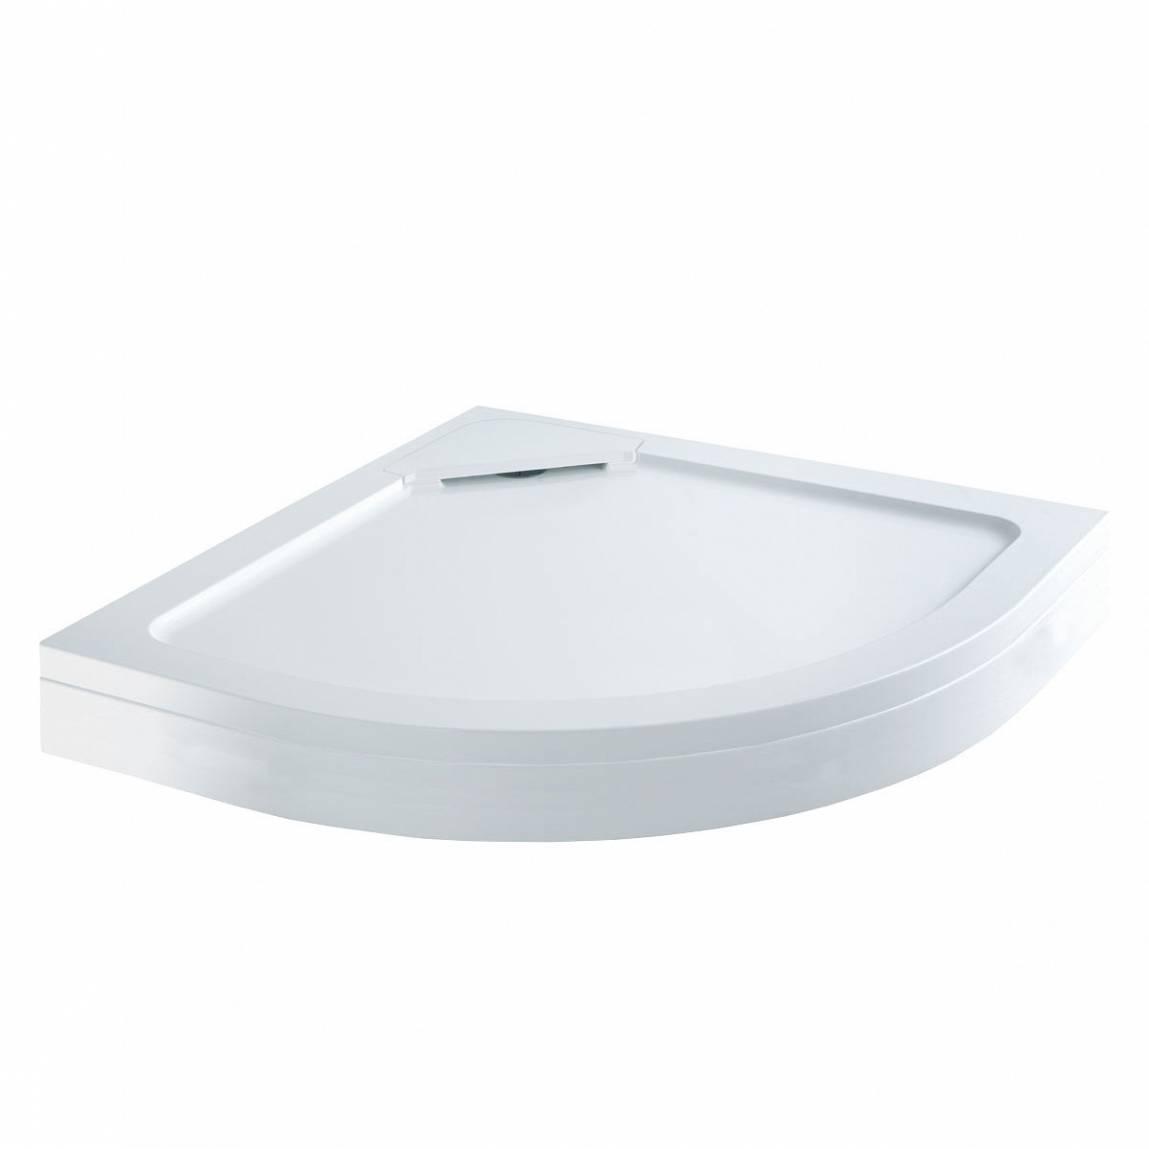 Image of Designer Quadrant Stone Shower Tray & Riser Kit 900 x 900